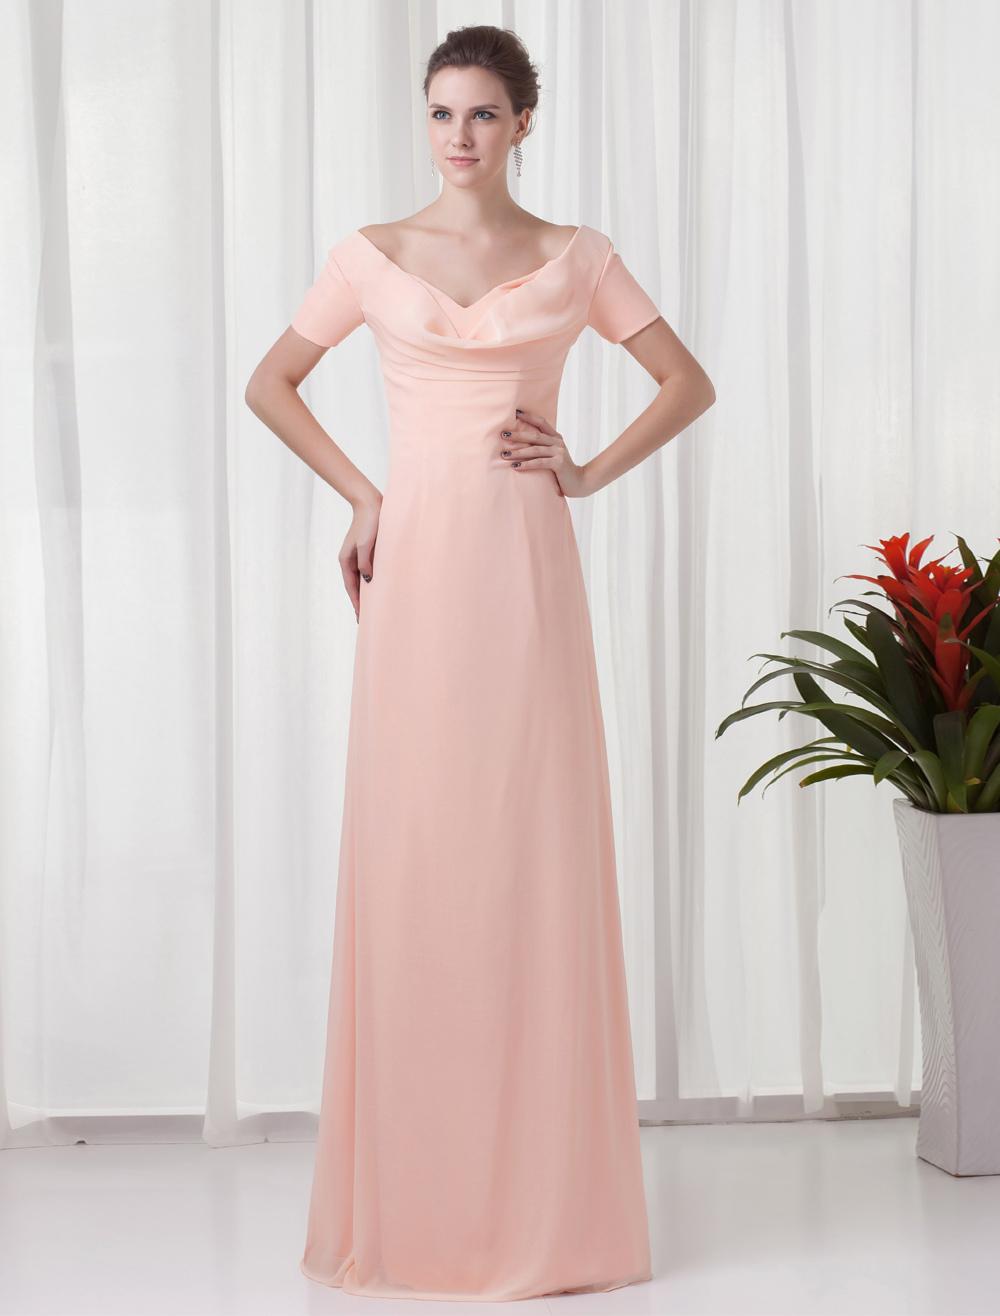 Chiffon Mother Of The Bride Dress Peach Short Sleeve Evening Dress V  Back Floor Length Occasion Dress